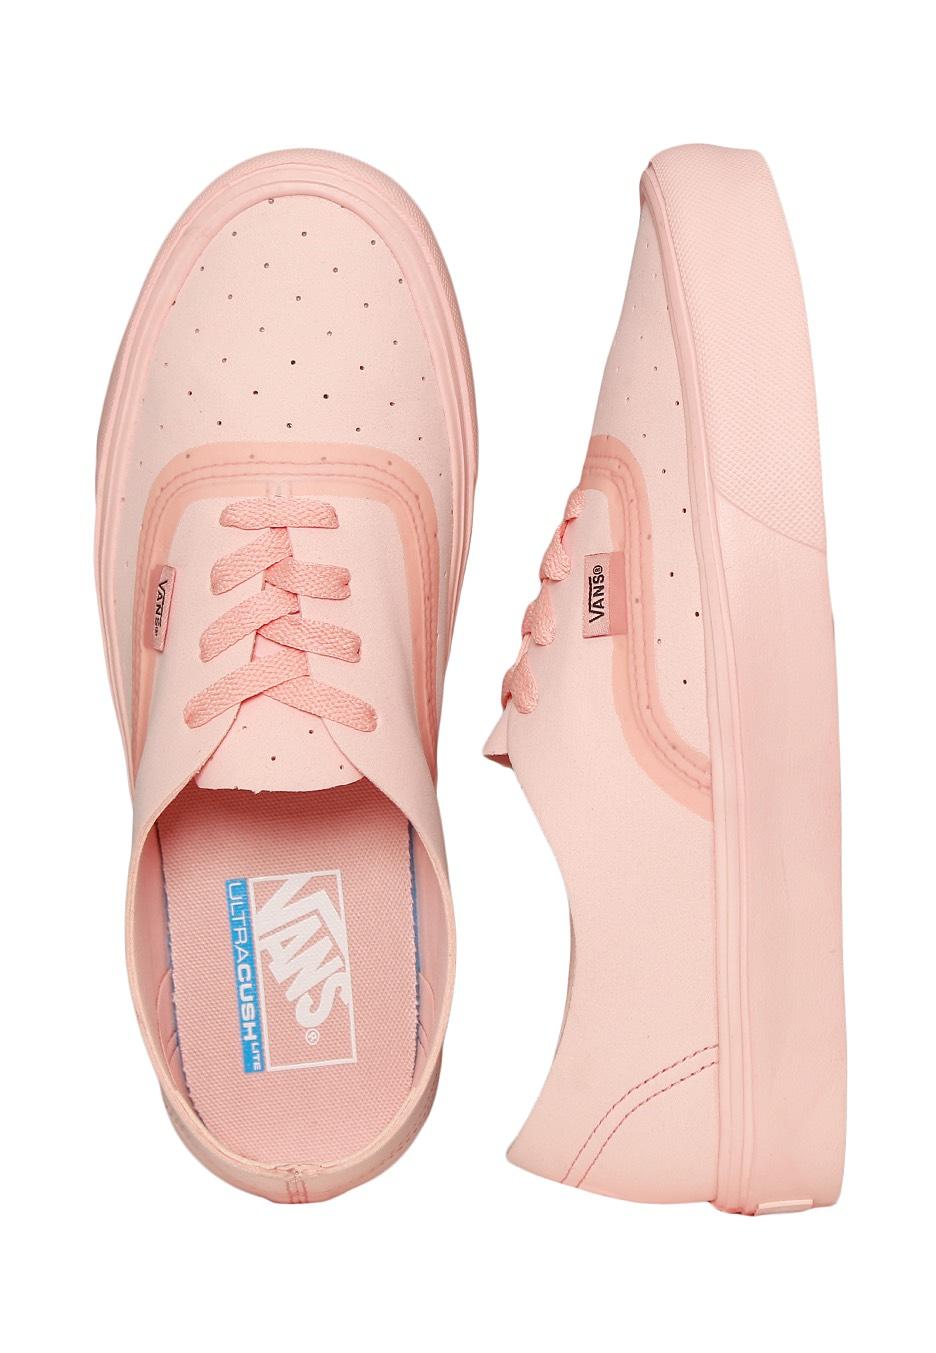 7401d03b74 Vans - Authentic Lite Rapidweld Perf Tropical Peach Tropical Peach - Girl  Shoes - Impericon.com Worldwide